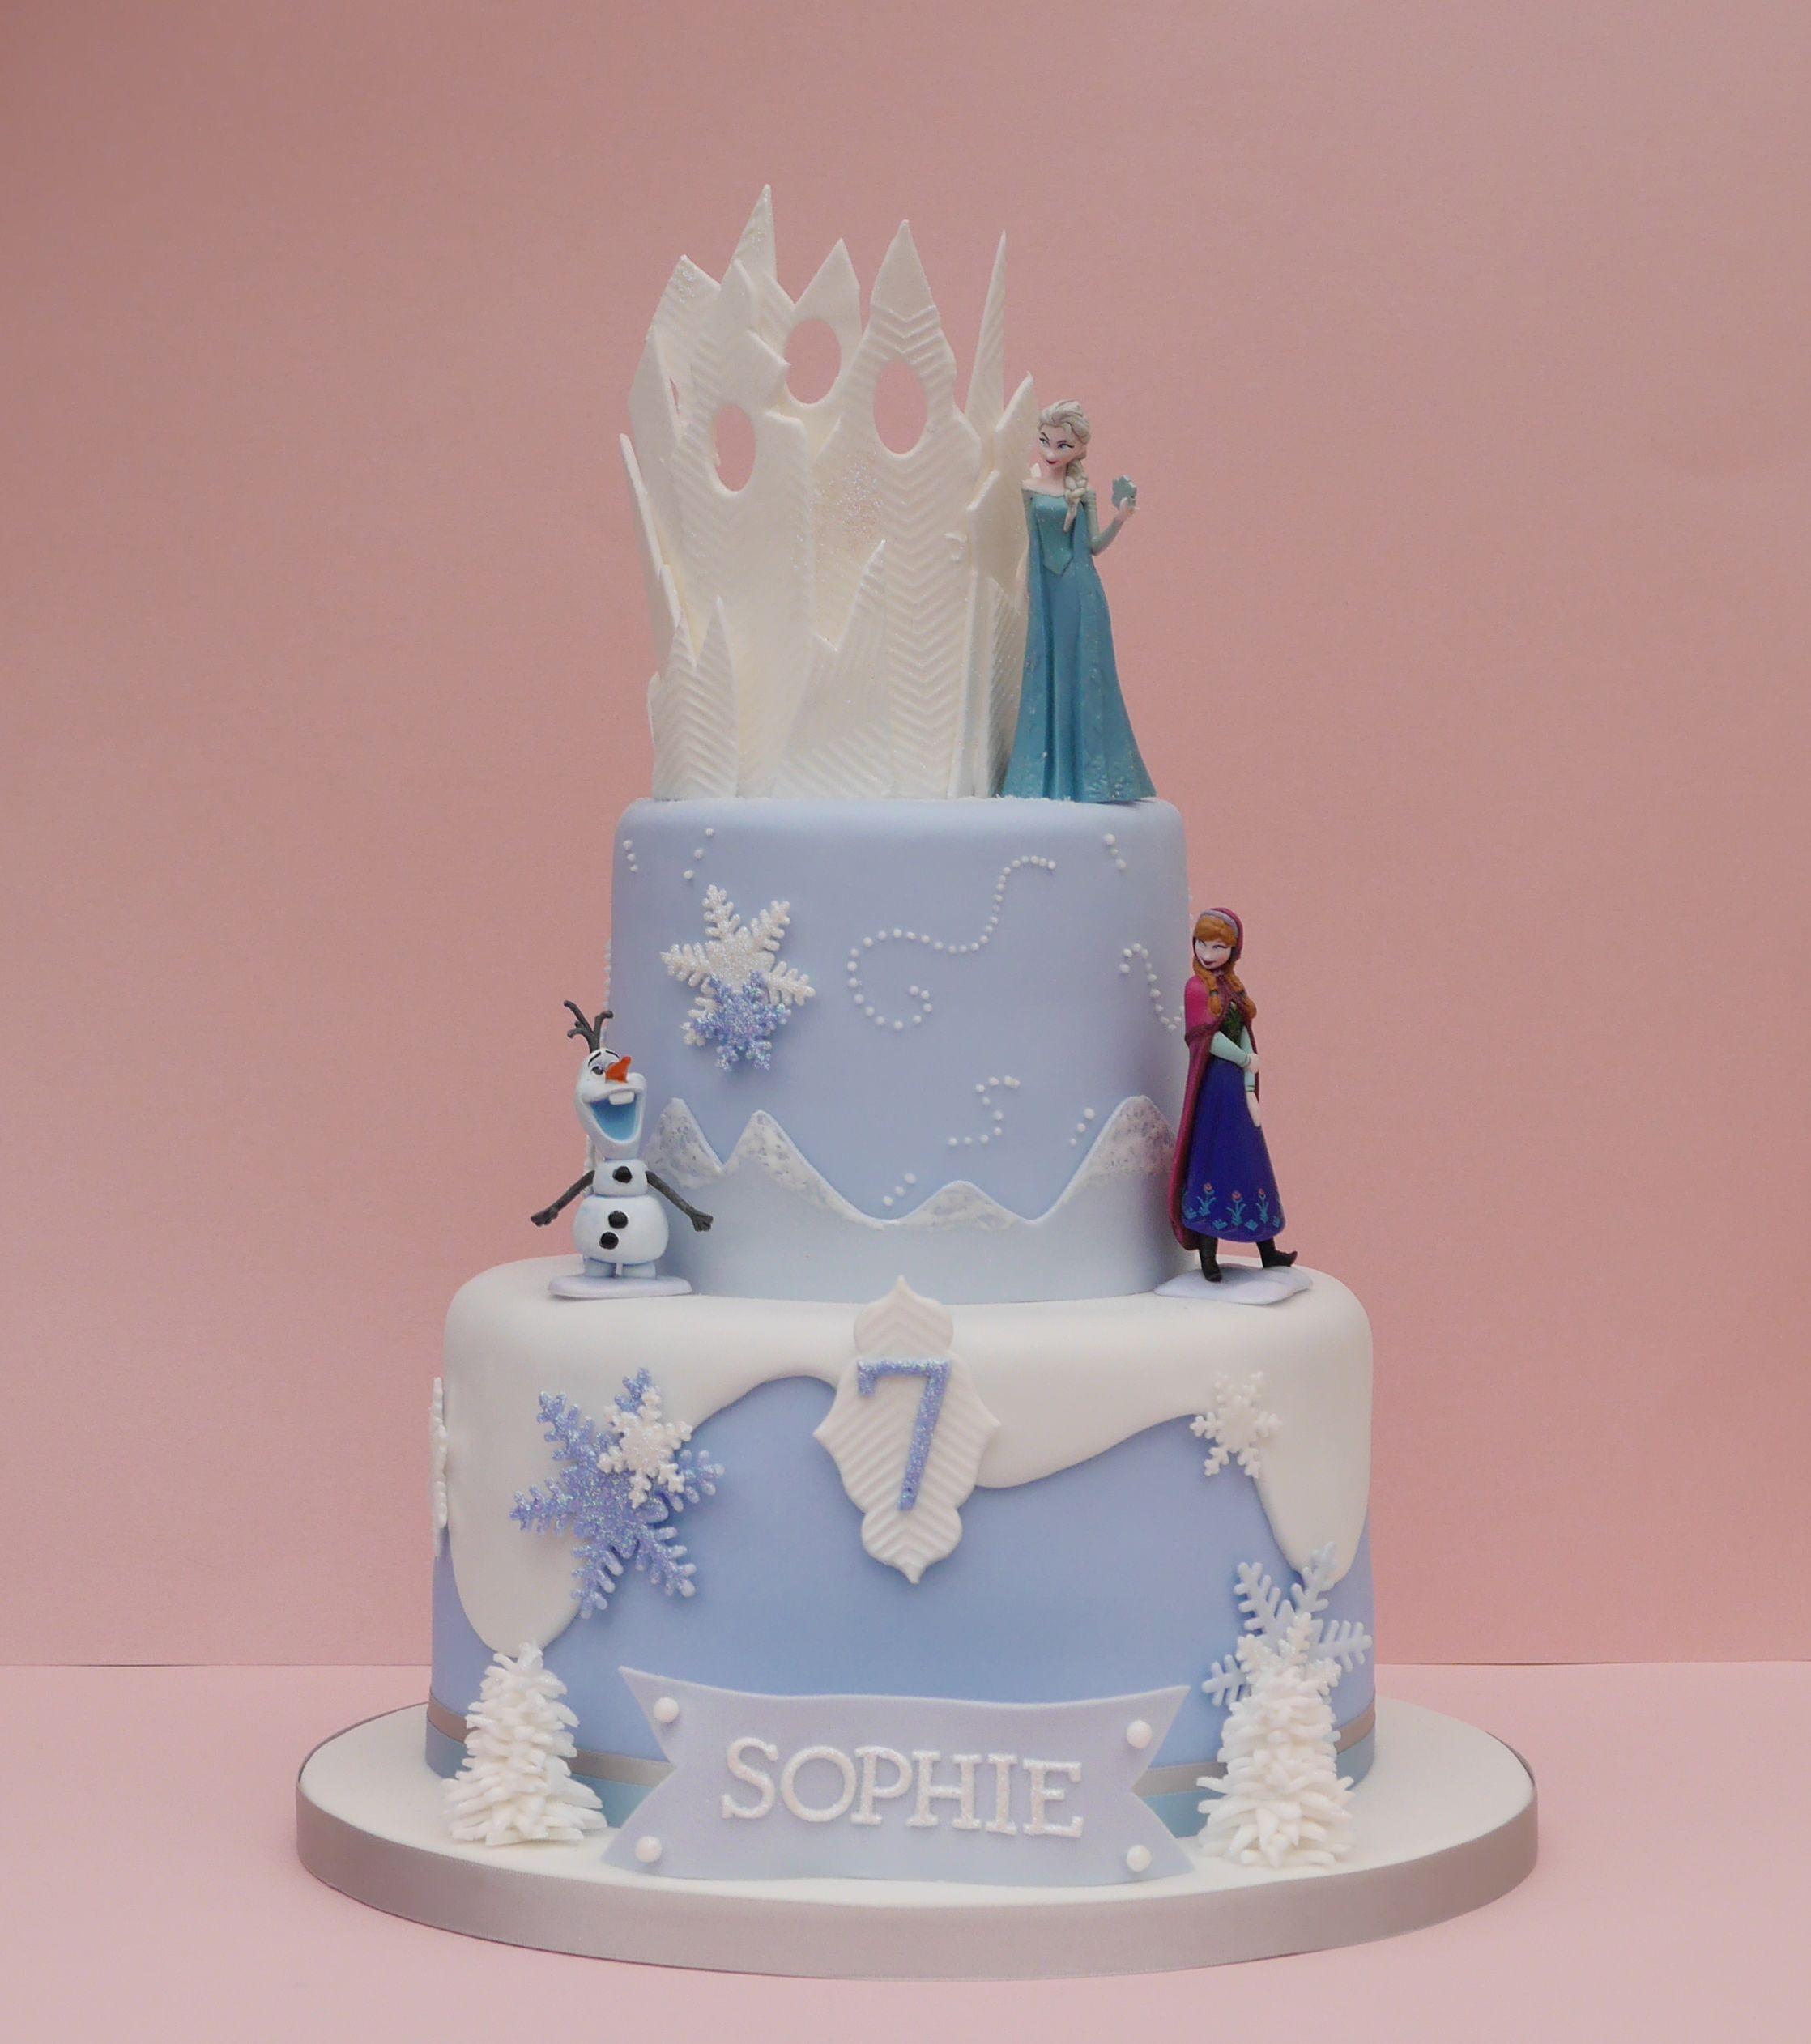 Disney Frozen themed birthday cake for Sophies 7th birthday www